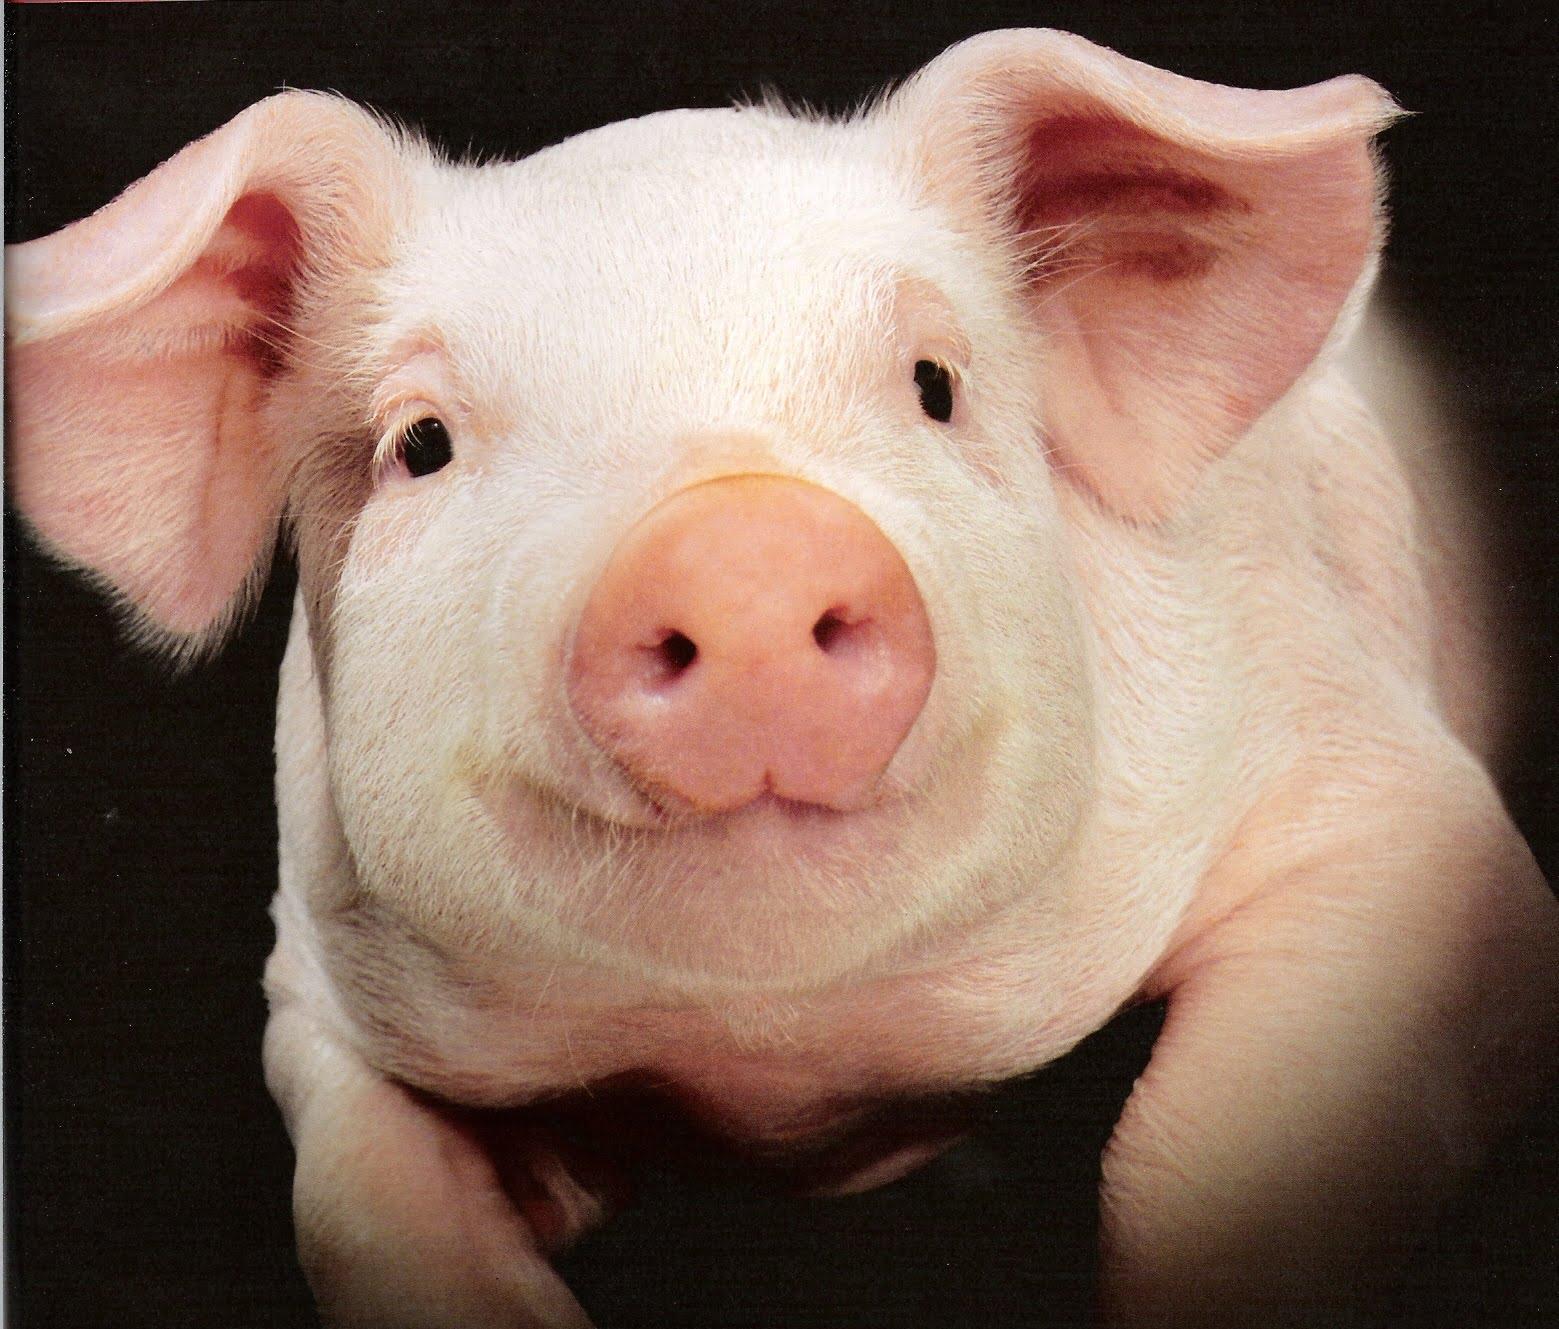 pig cute pigs face piglet piglets cerdo portrait animals farm animal close intended offense obama piggy adorable cutest pretty piggie